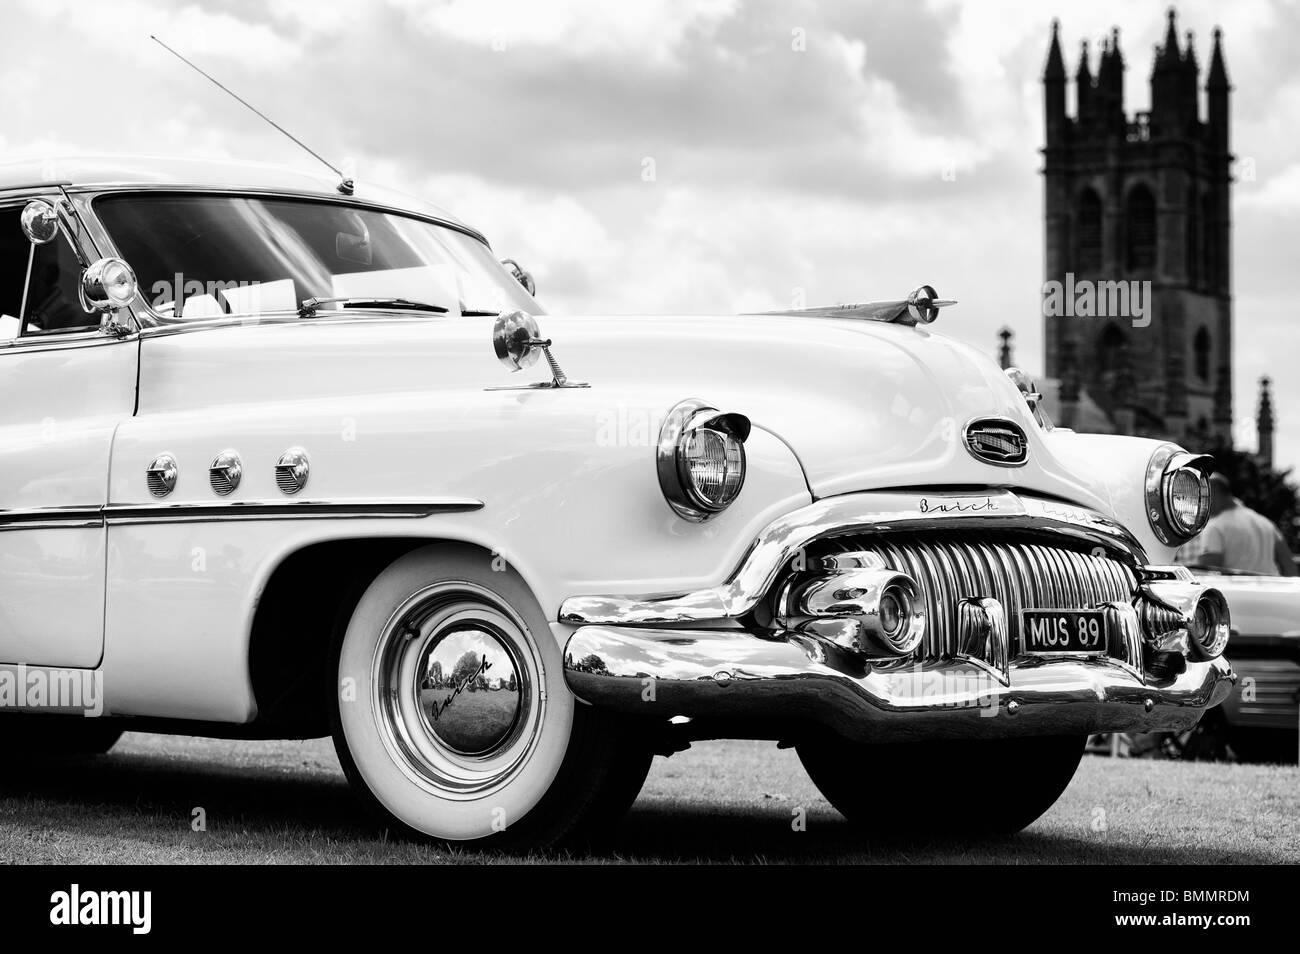 Buick acht Front End, ein klassisches amerikanisches Auto, an Churchill vintage car Show, Oxfordshire, England. Stockbild